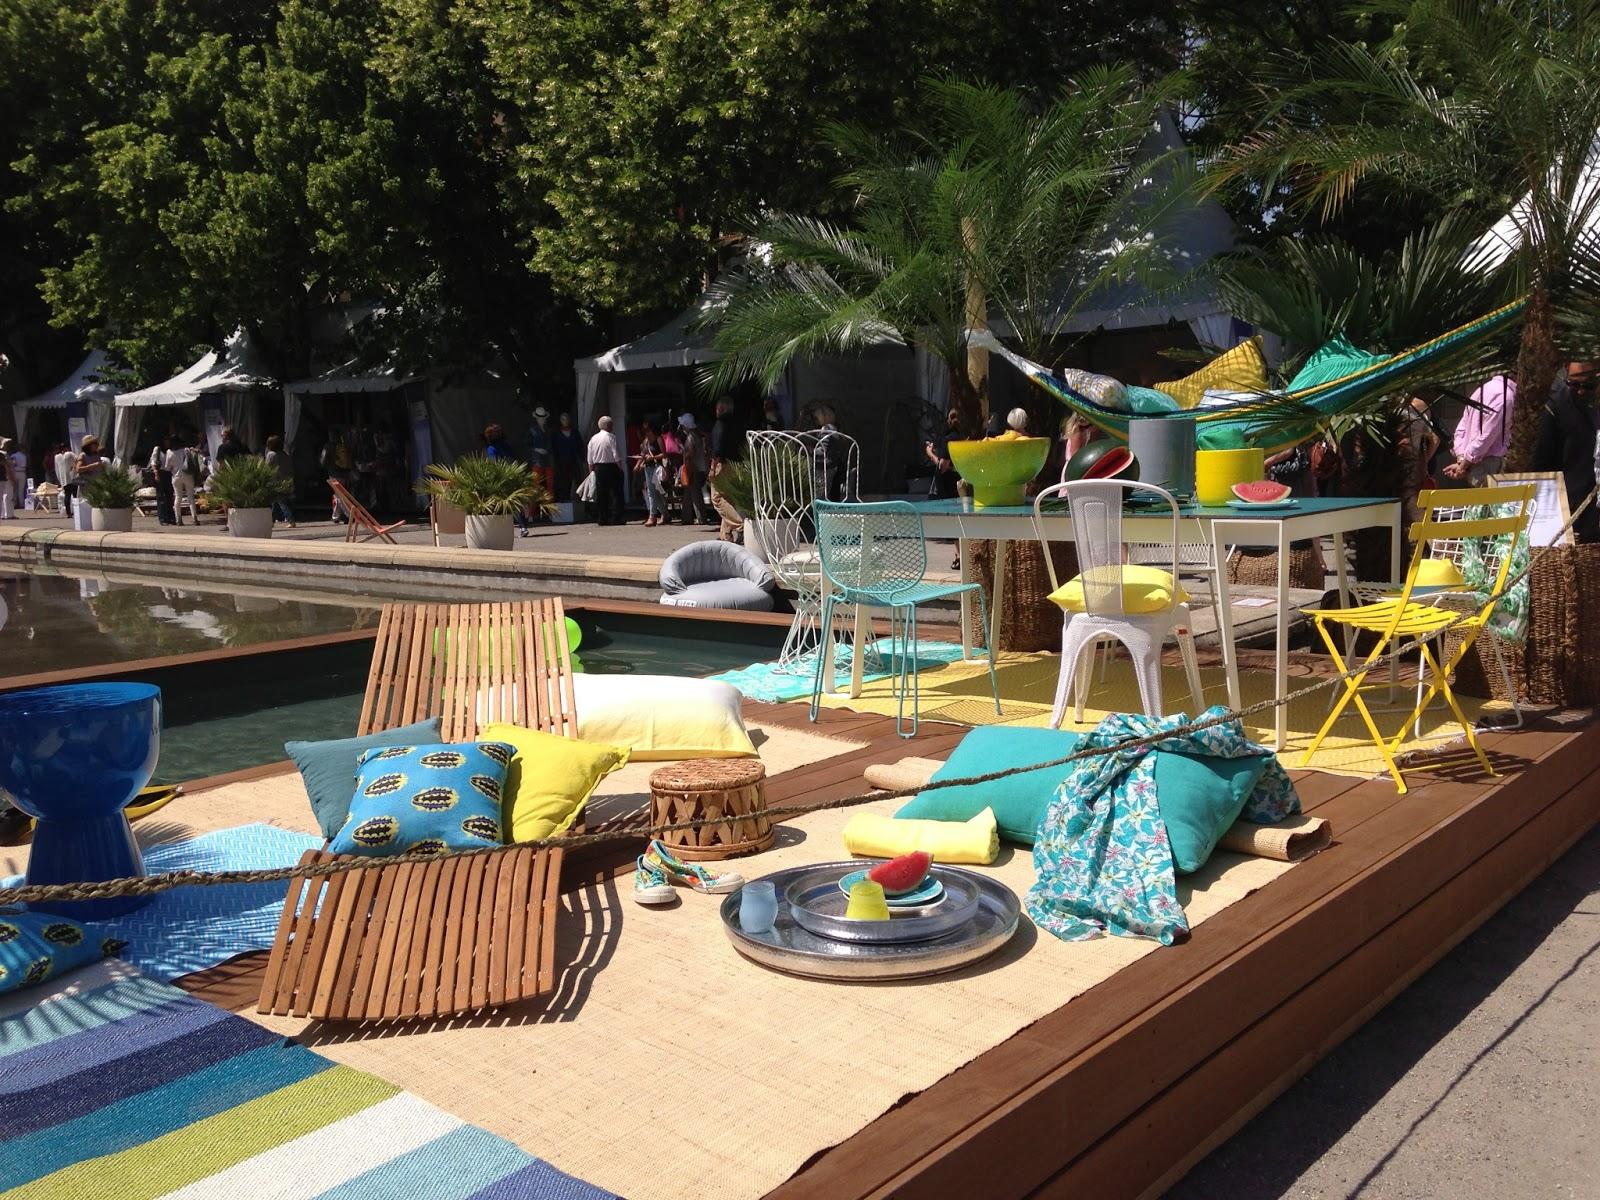 hypiness salon vivre c t sud aix en provence. Black Bedroom Furniture Sets. Home Design Ideas